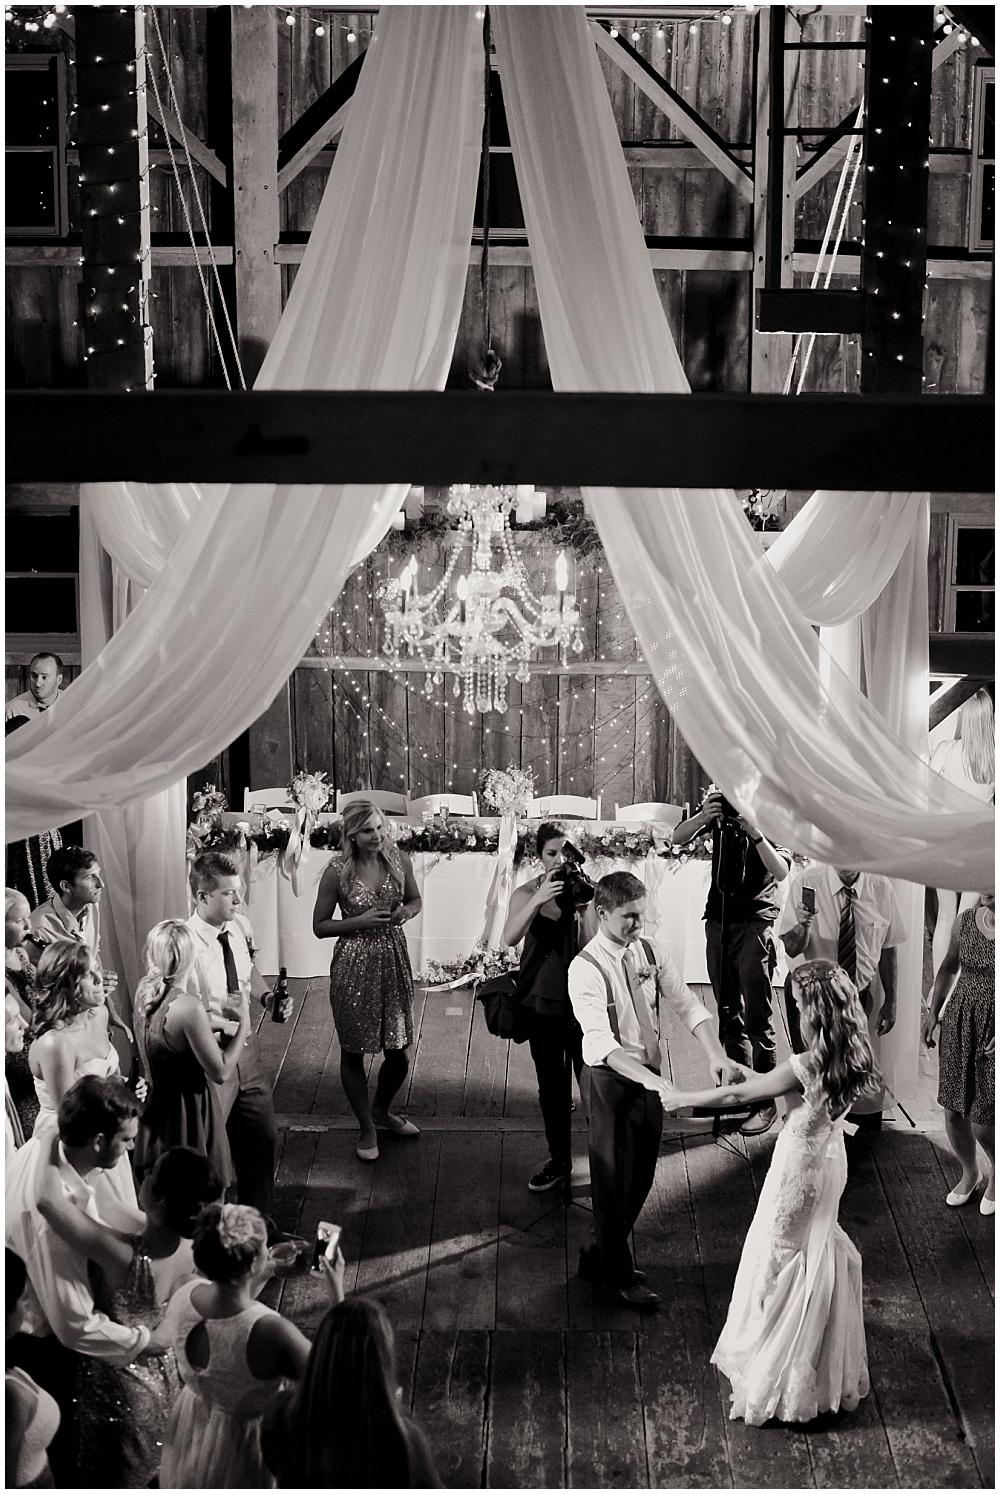 First Dance under chandelier and draped fabric | Mustard Seed Gardens Wedding by Sara Ackermann Photography & Jessica Dum Wedding Coordination